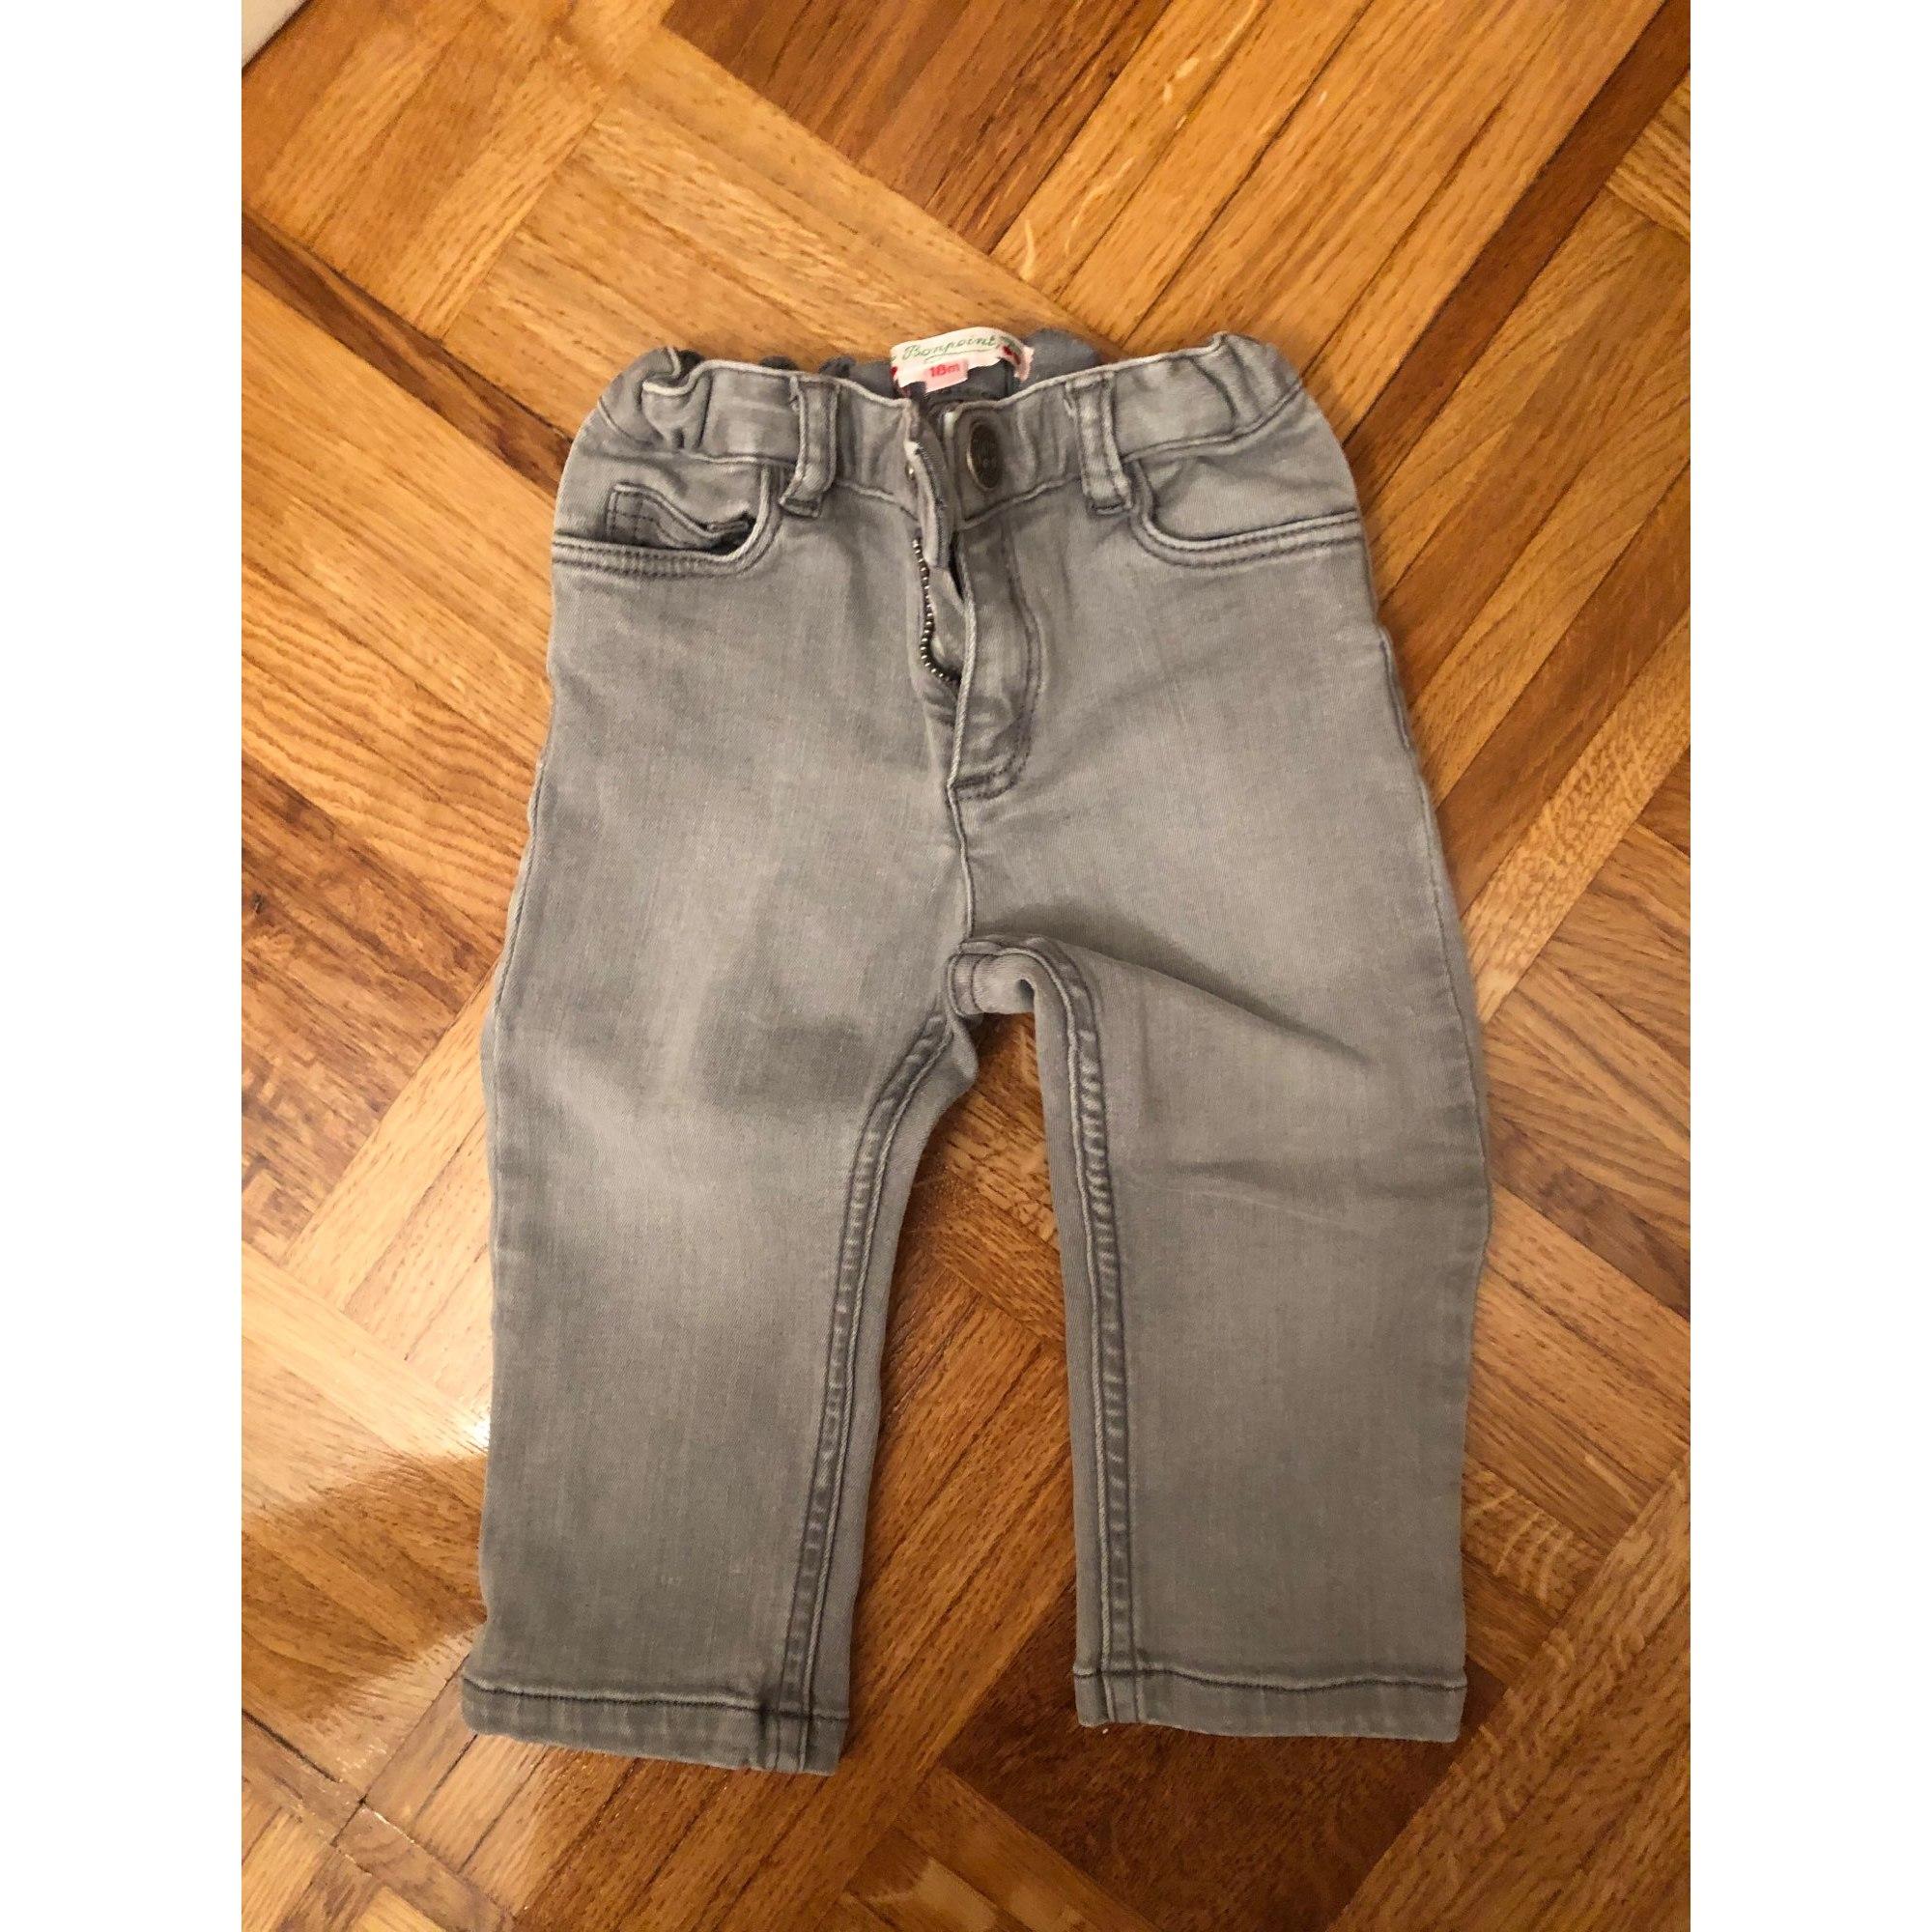 Pantalon BONPOINT Gris, anthracite